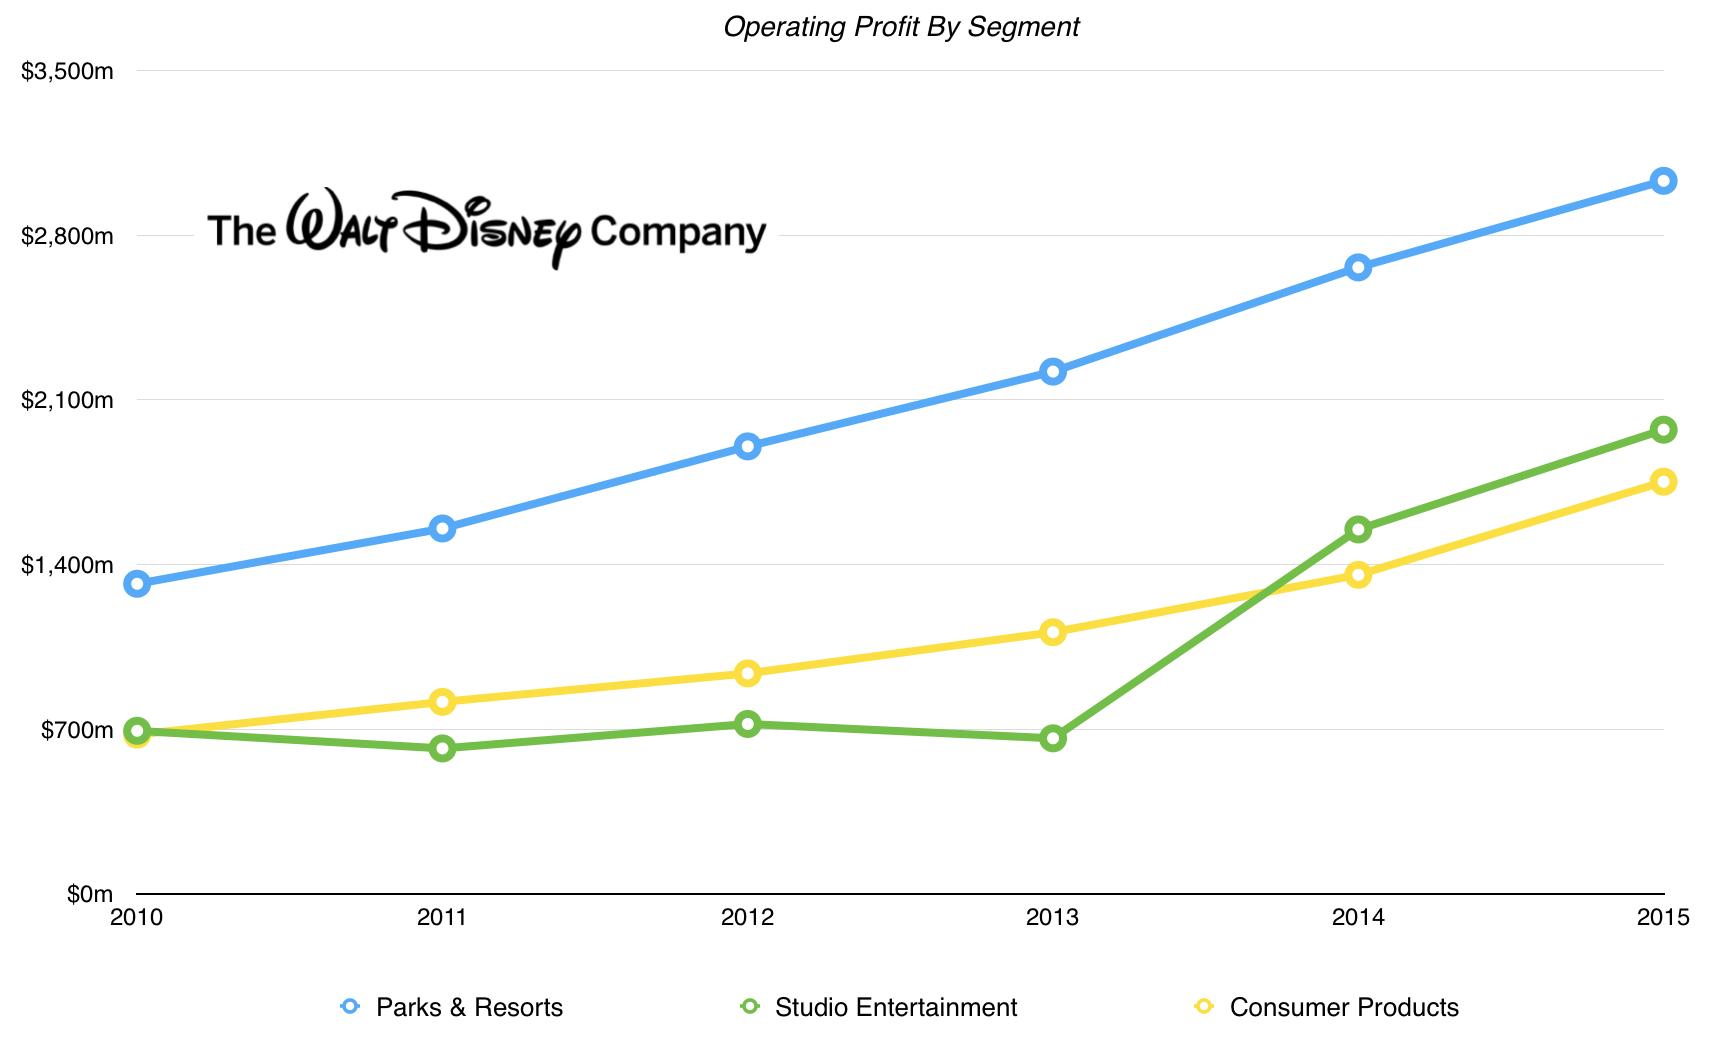 DisneySegmentsOperatingIncome